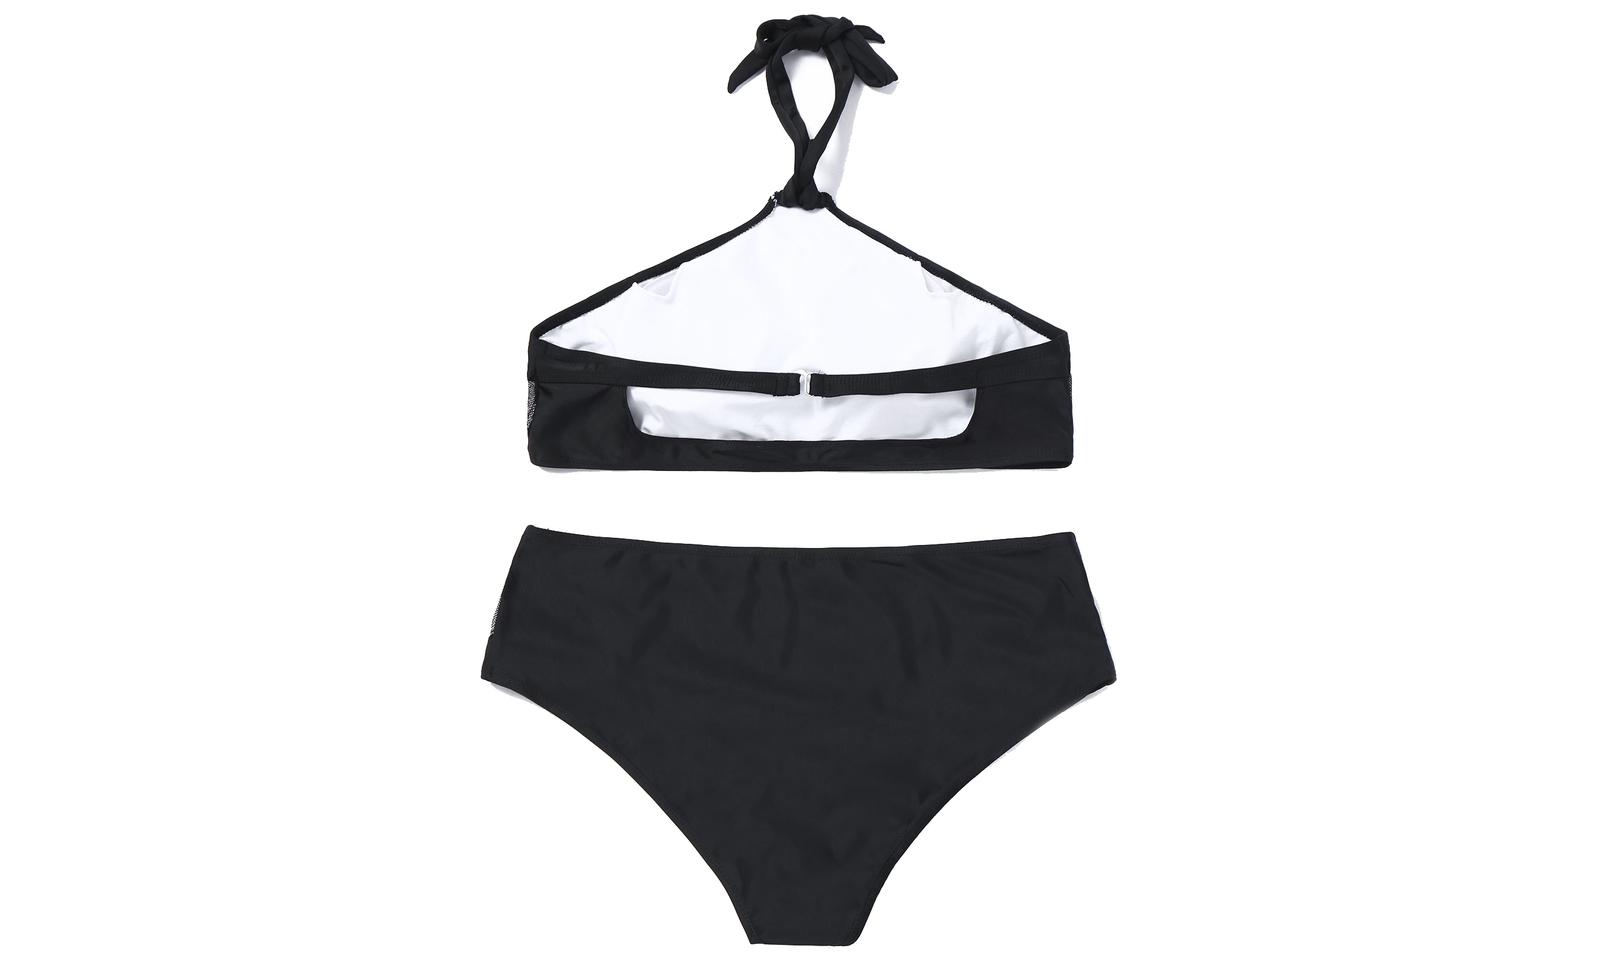 Women's Halter Plus Size High Waist Two Pieces Bikini Set